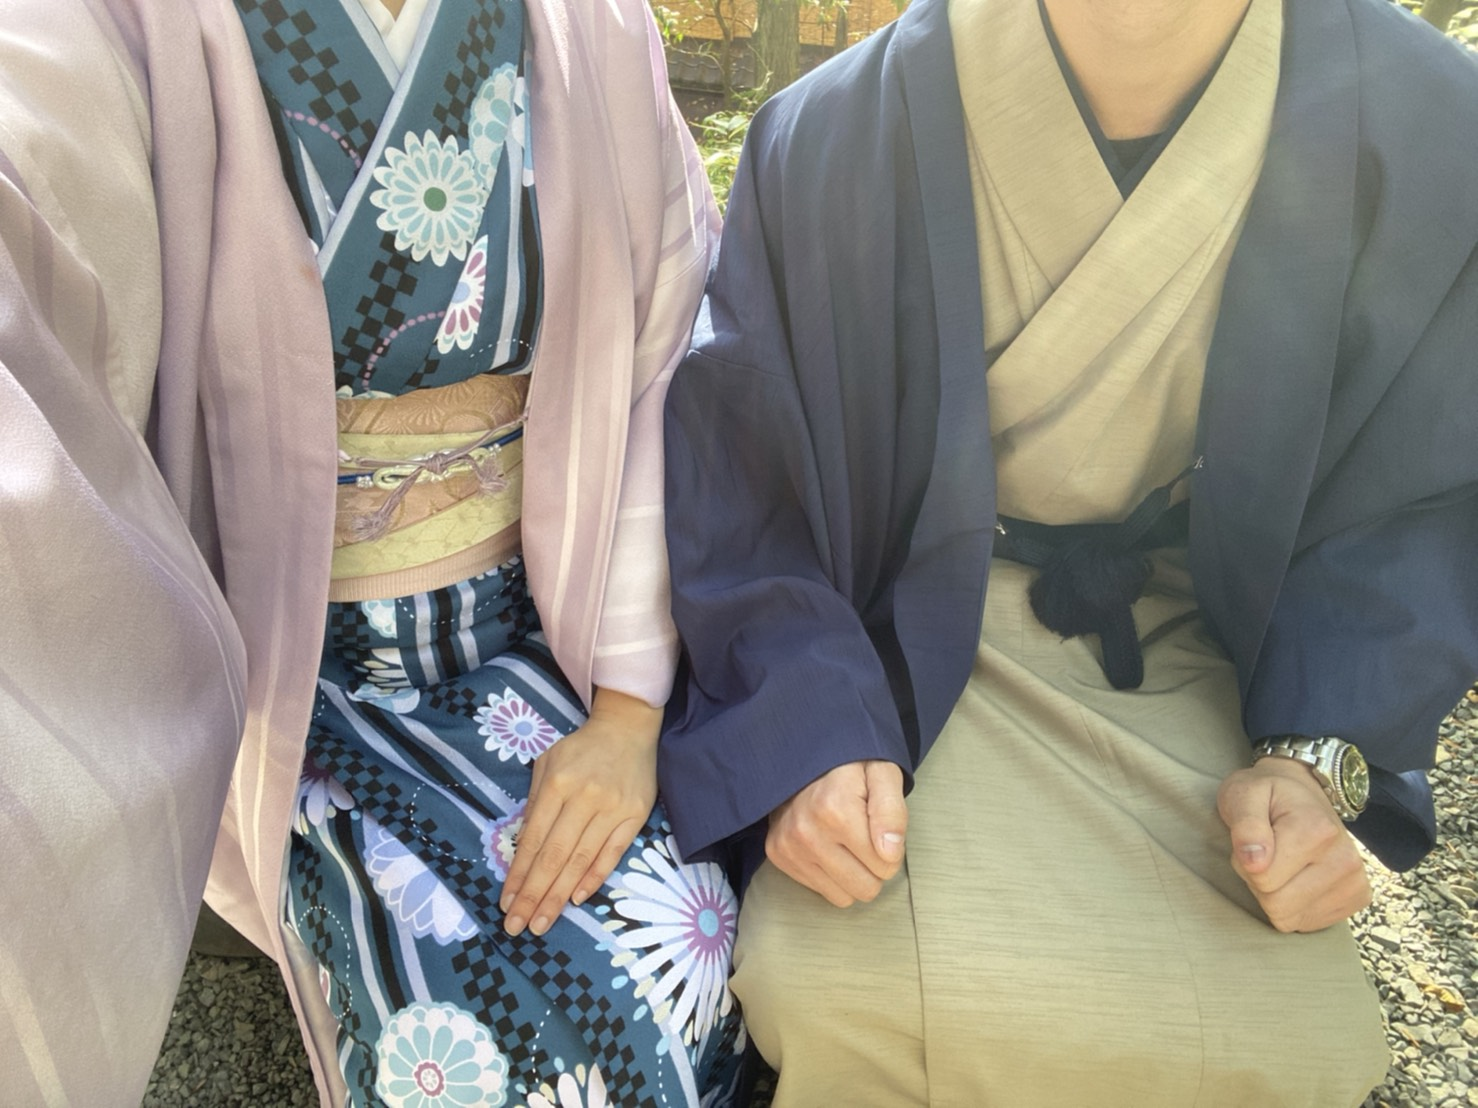 FLOWERS BY NAKED 2019 京都・二条城 大人気2019年11月17日4